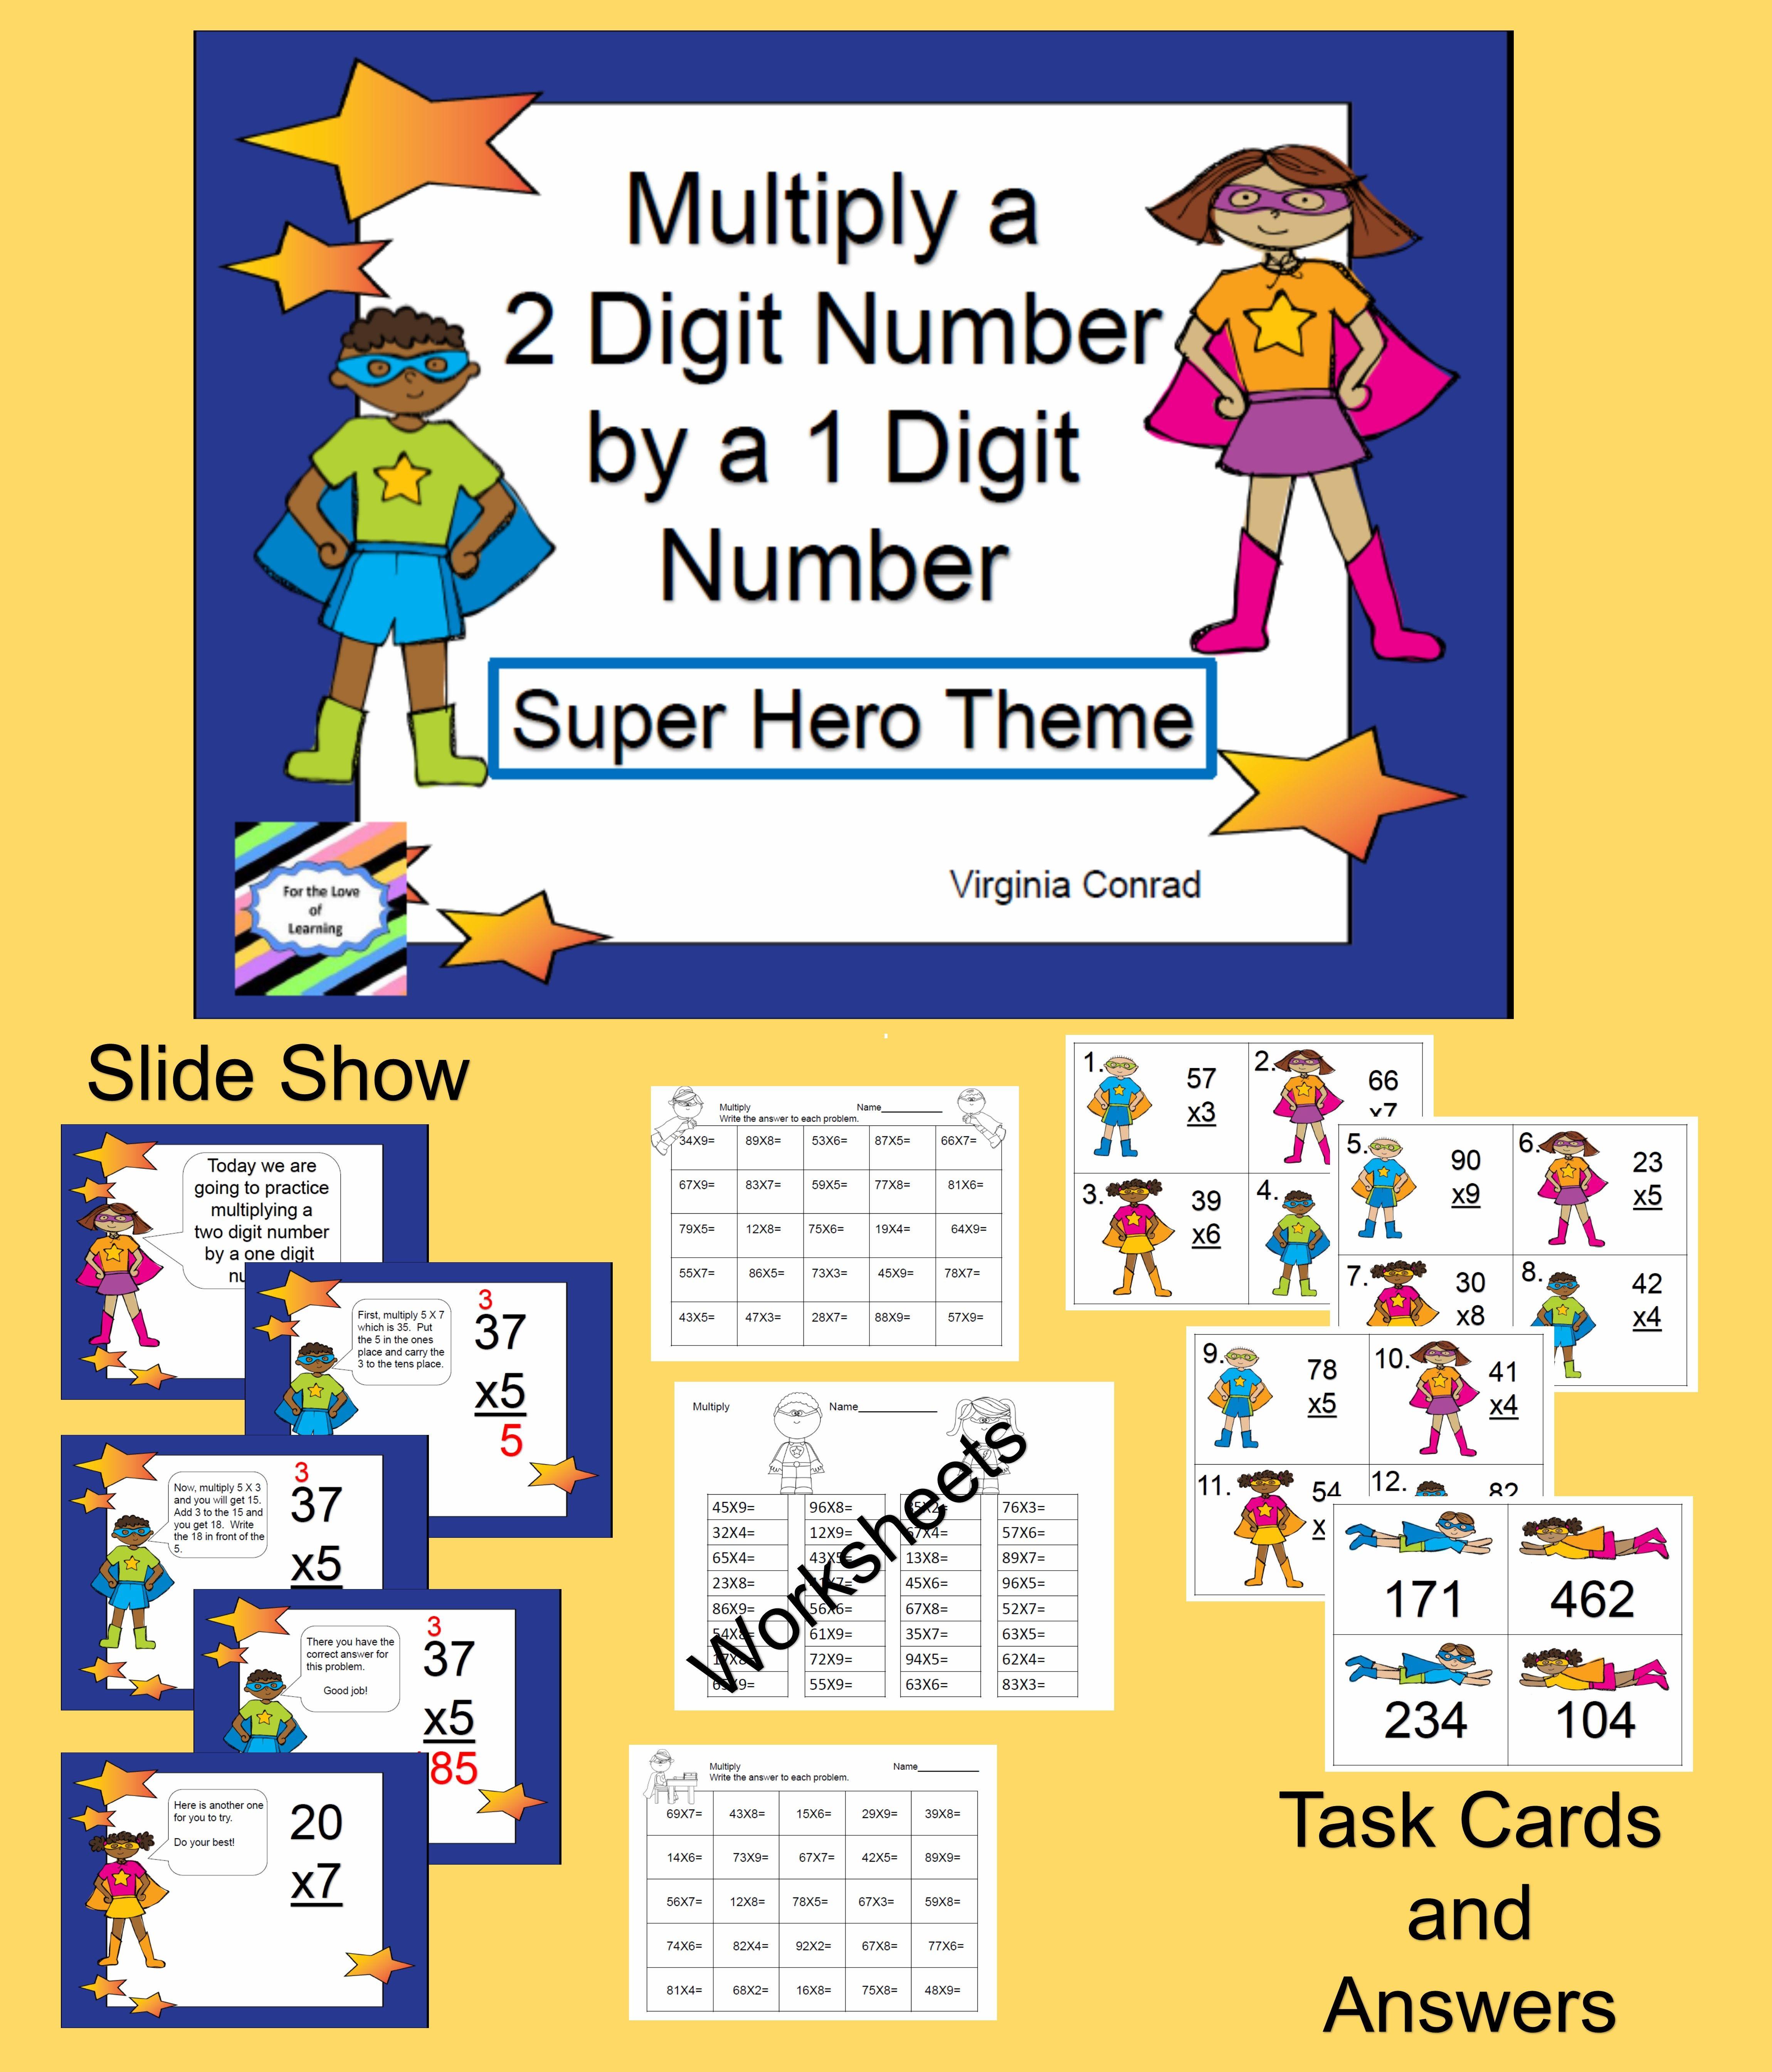 Multiply 2 Digit Number By 1 Digit Number Super Hero